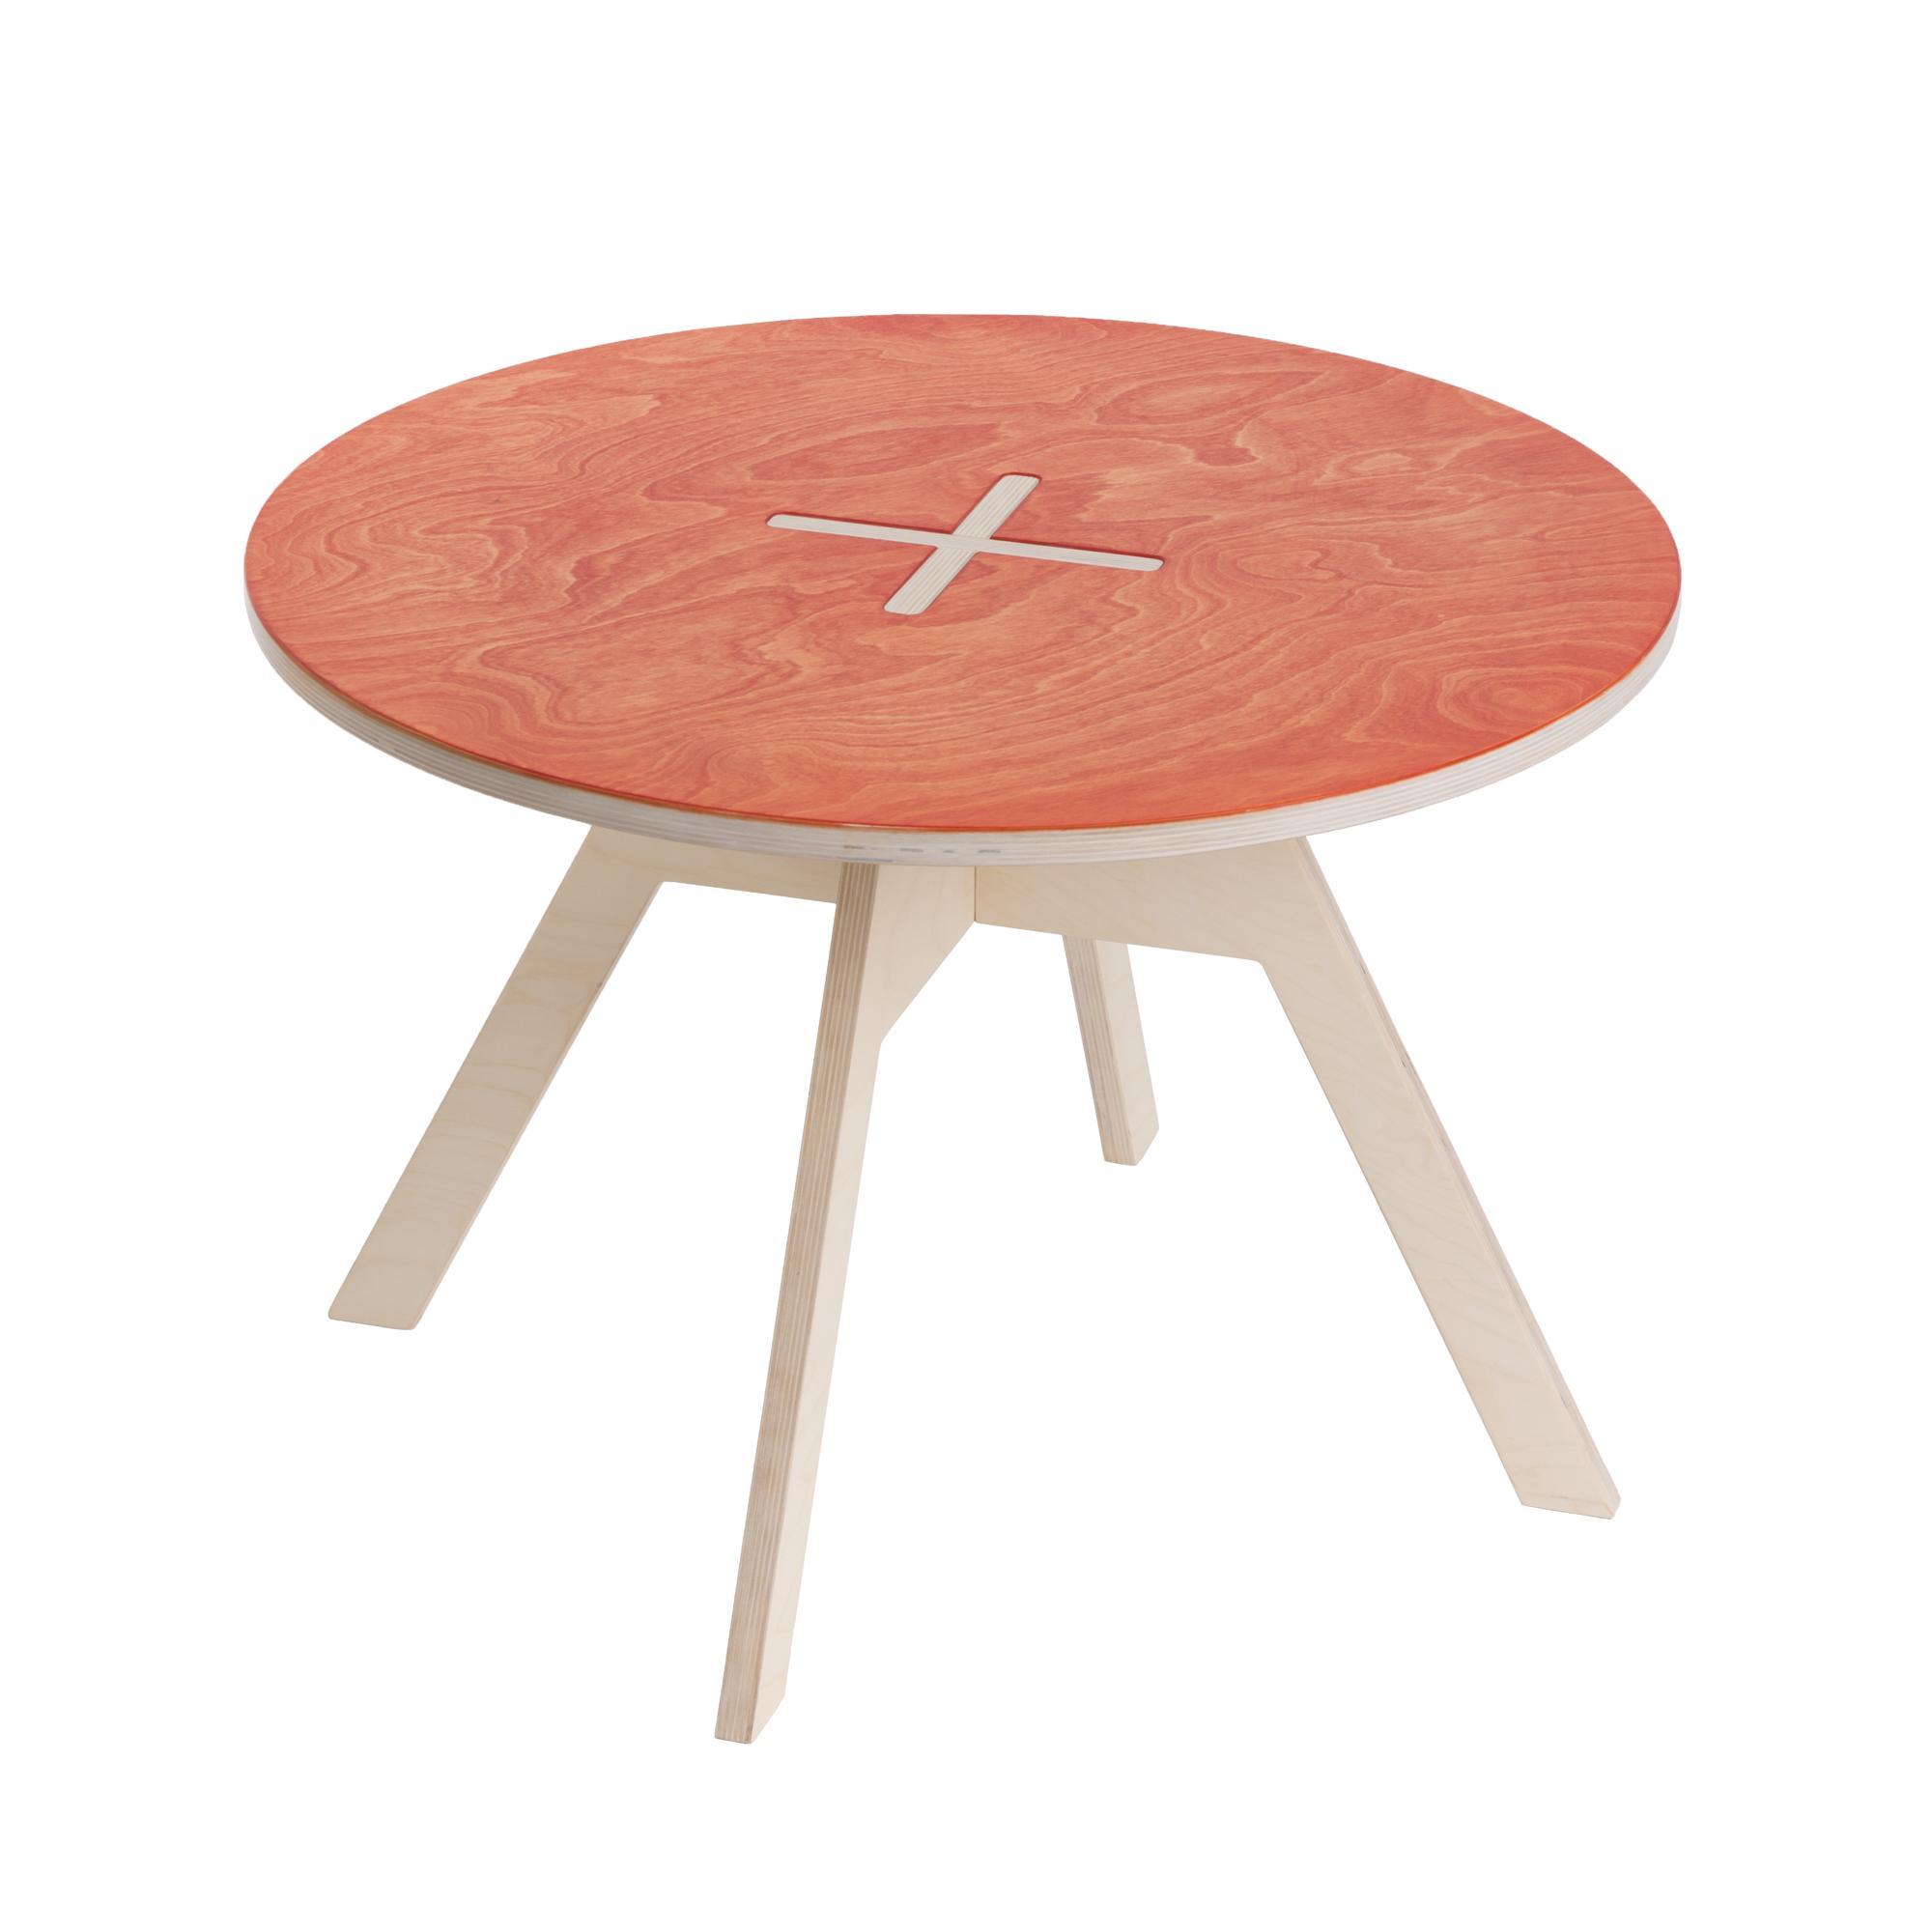 kinderzimmertisch aus birkenholz rot. Black Bedroom Furniture Sets. Home Design Ideas